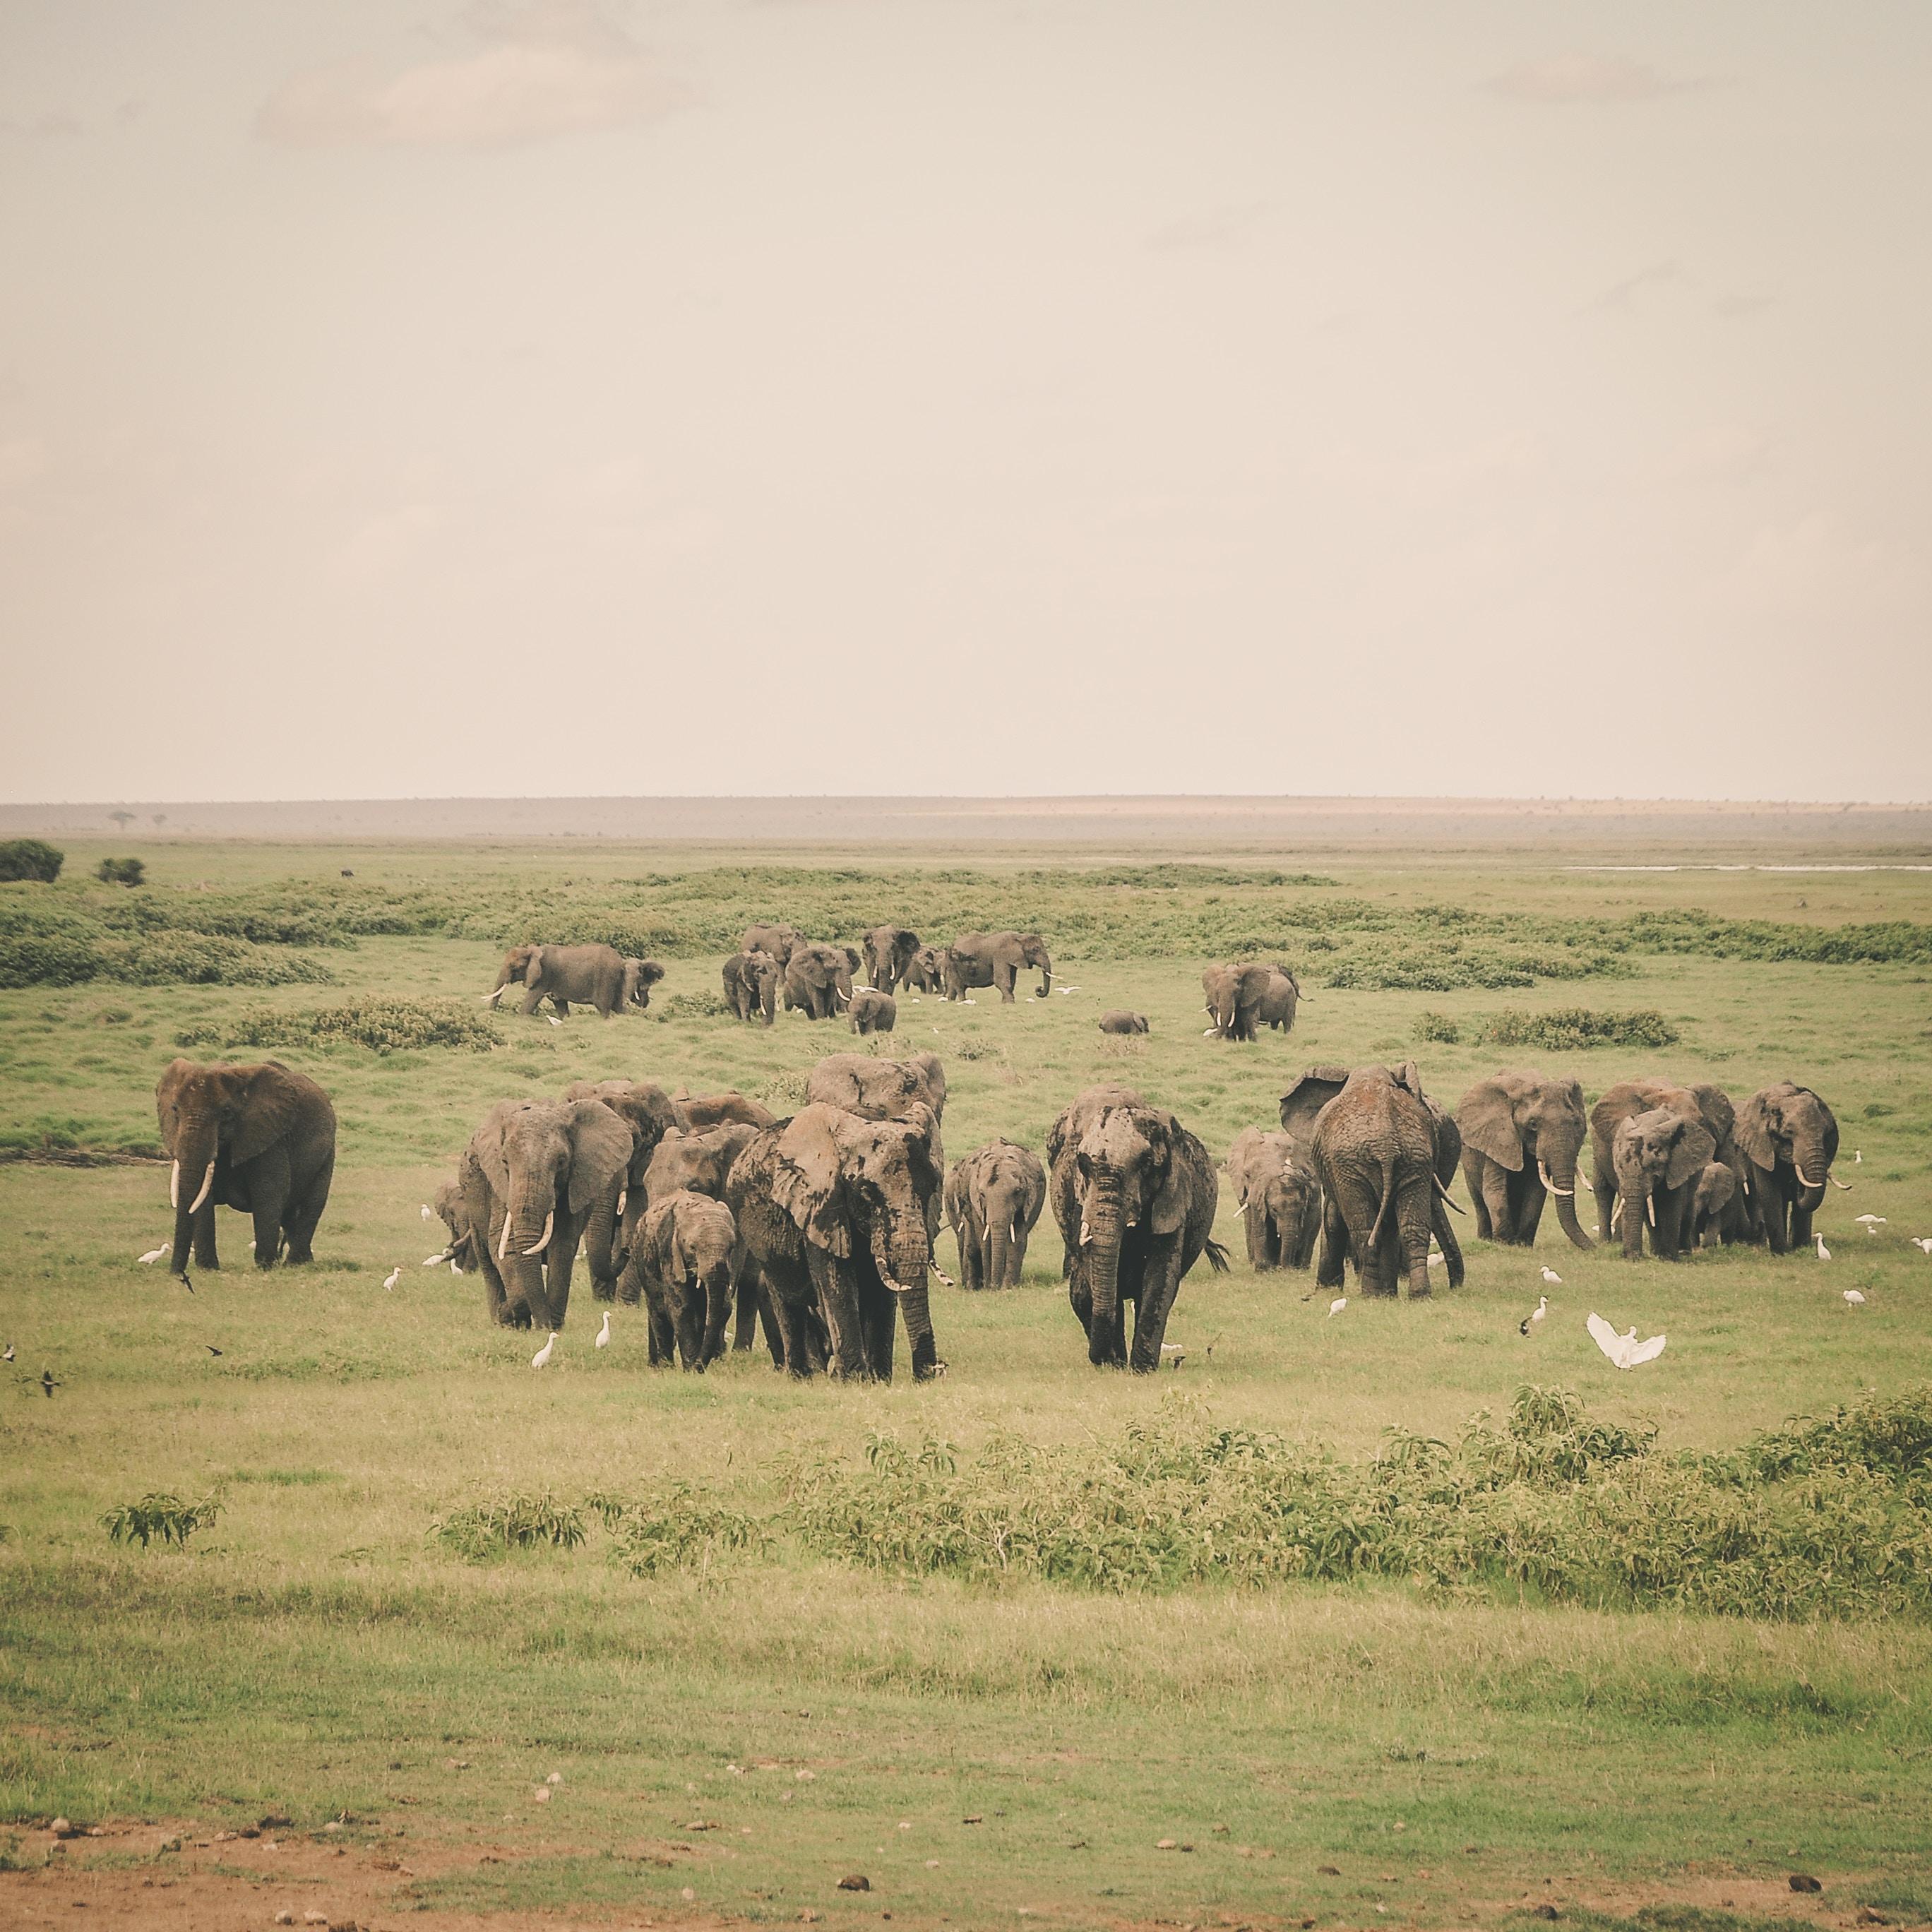 Elephants in Kenya grazing in the Maasai Mara